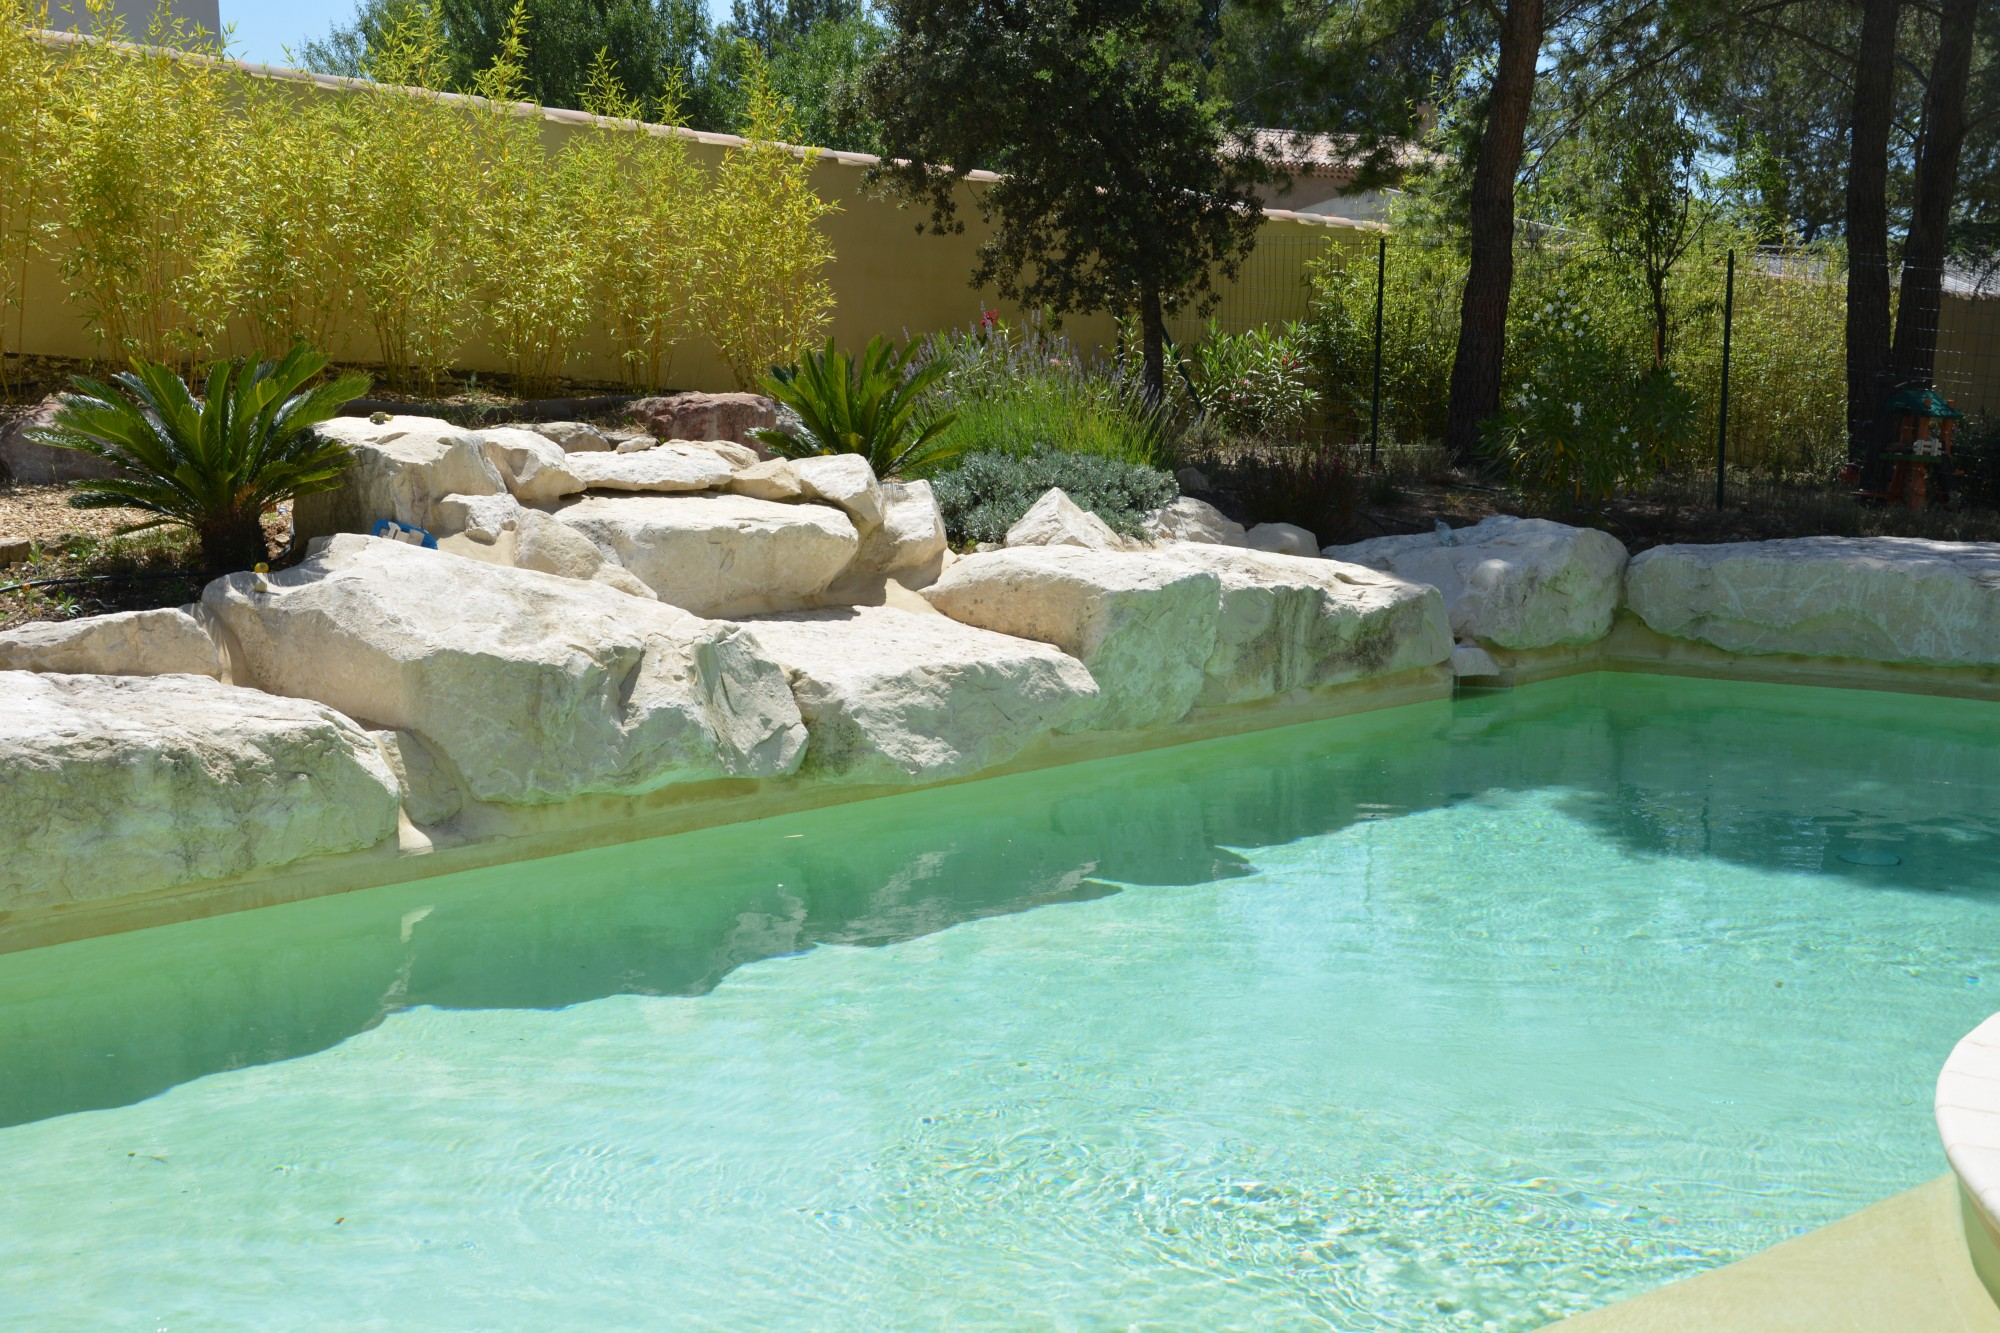 Ventes au coeur du luberon belle villa avec piscine for Camping luberon avec piscine